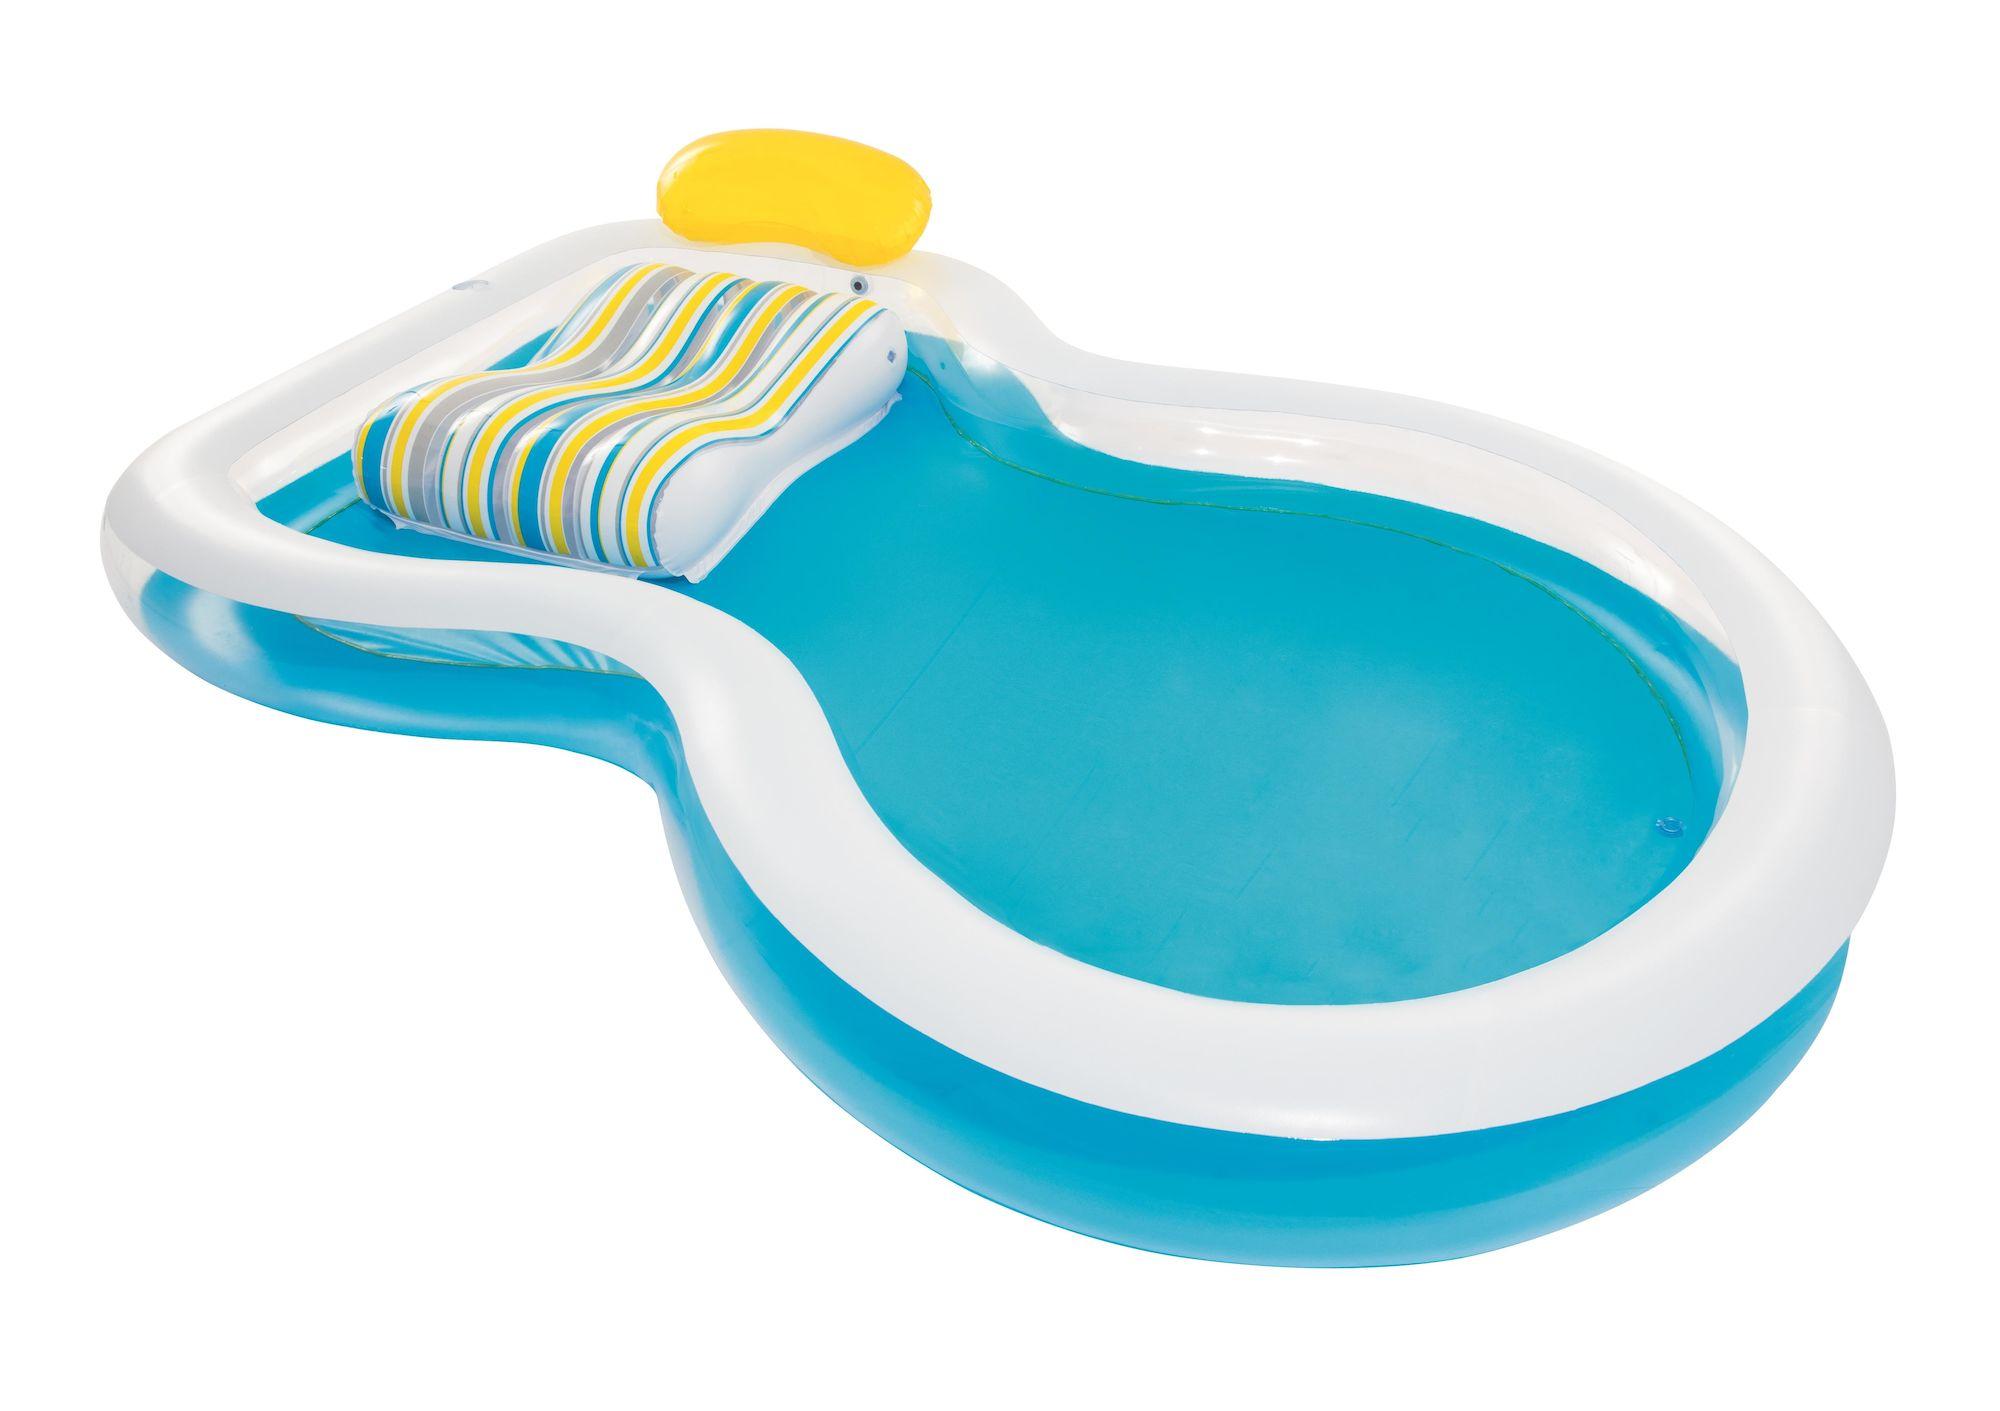 Bestway Pool Staycation